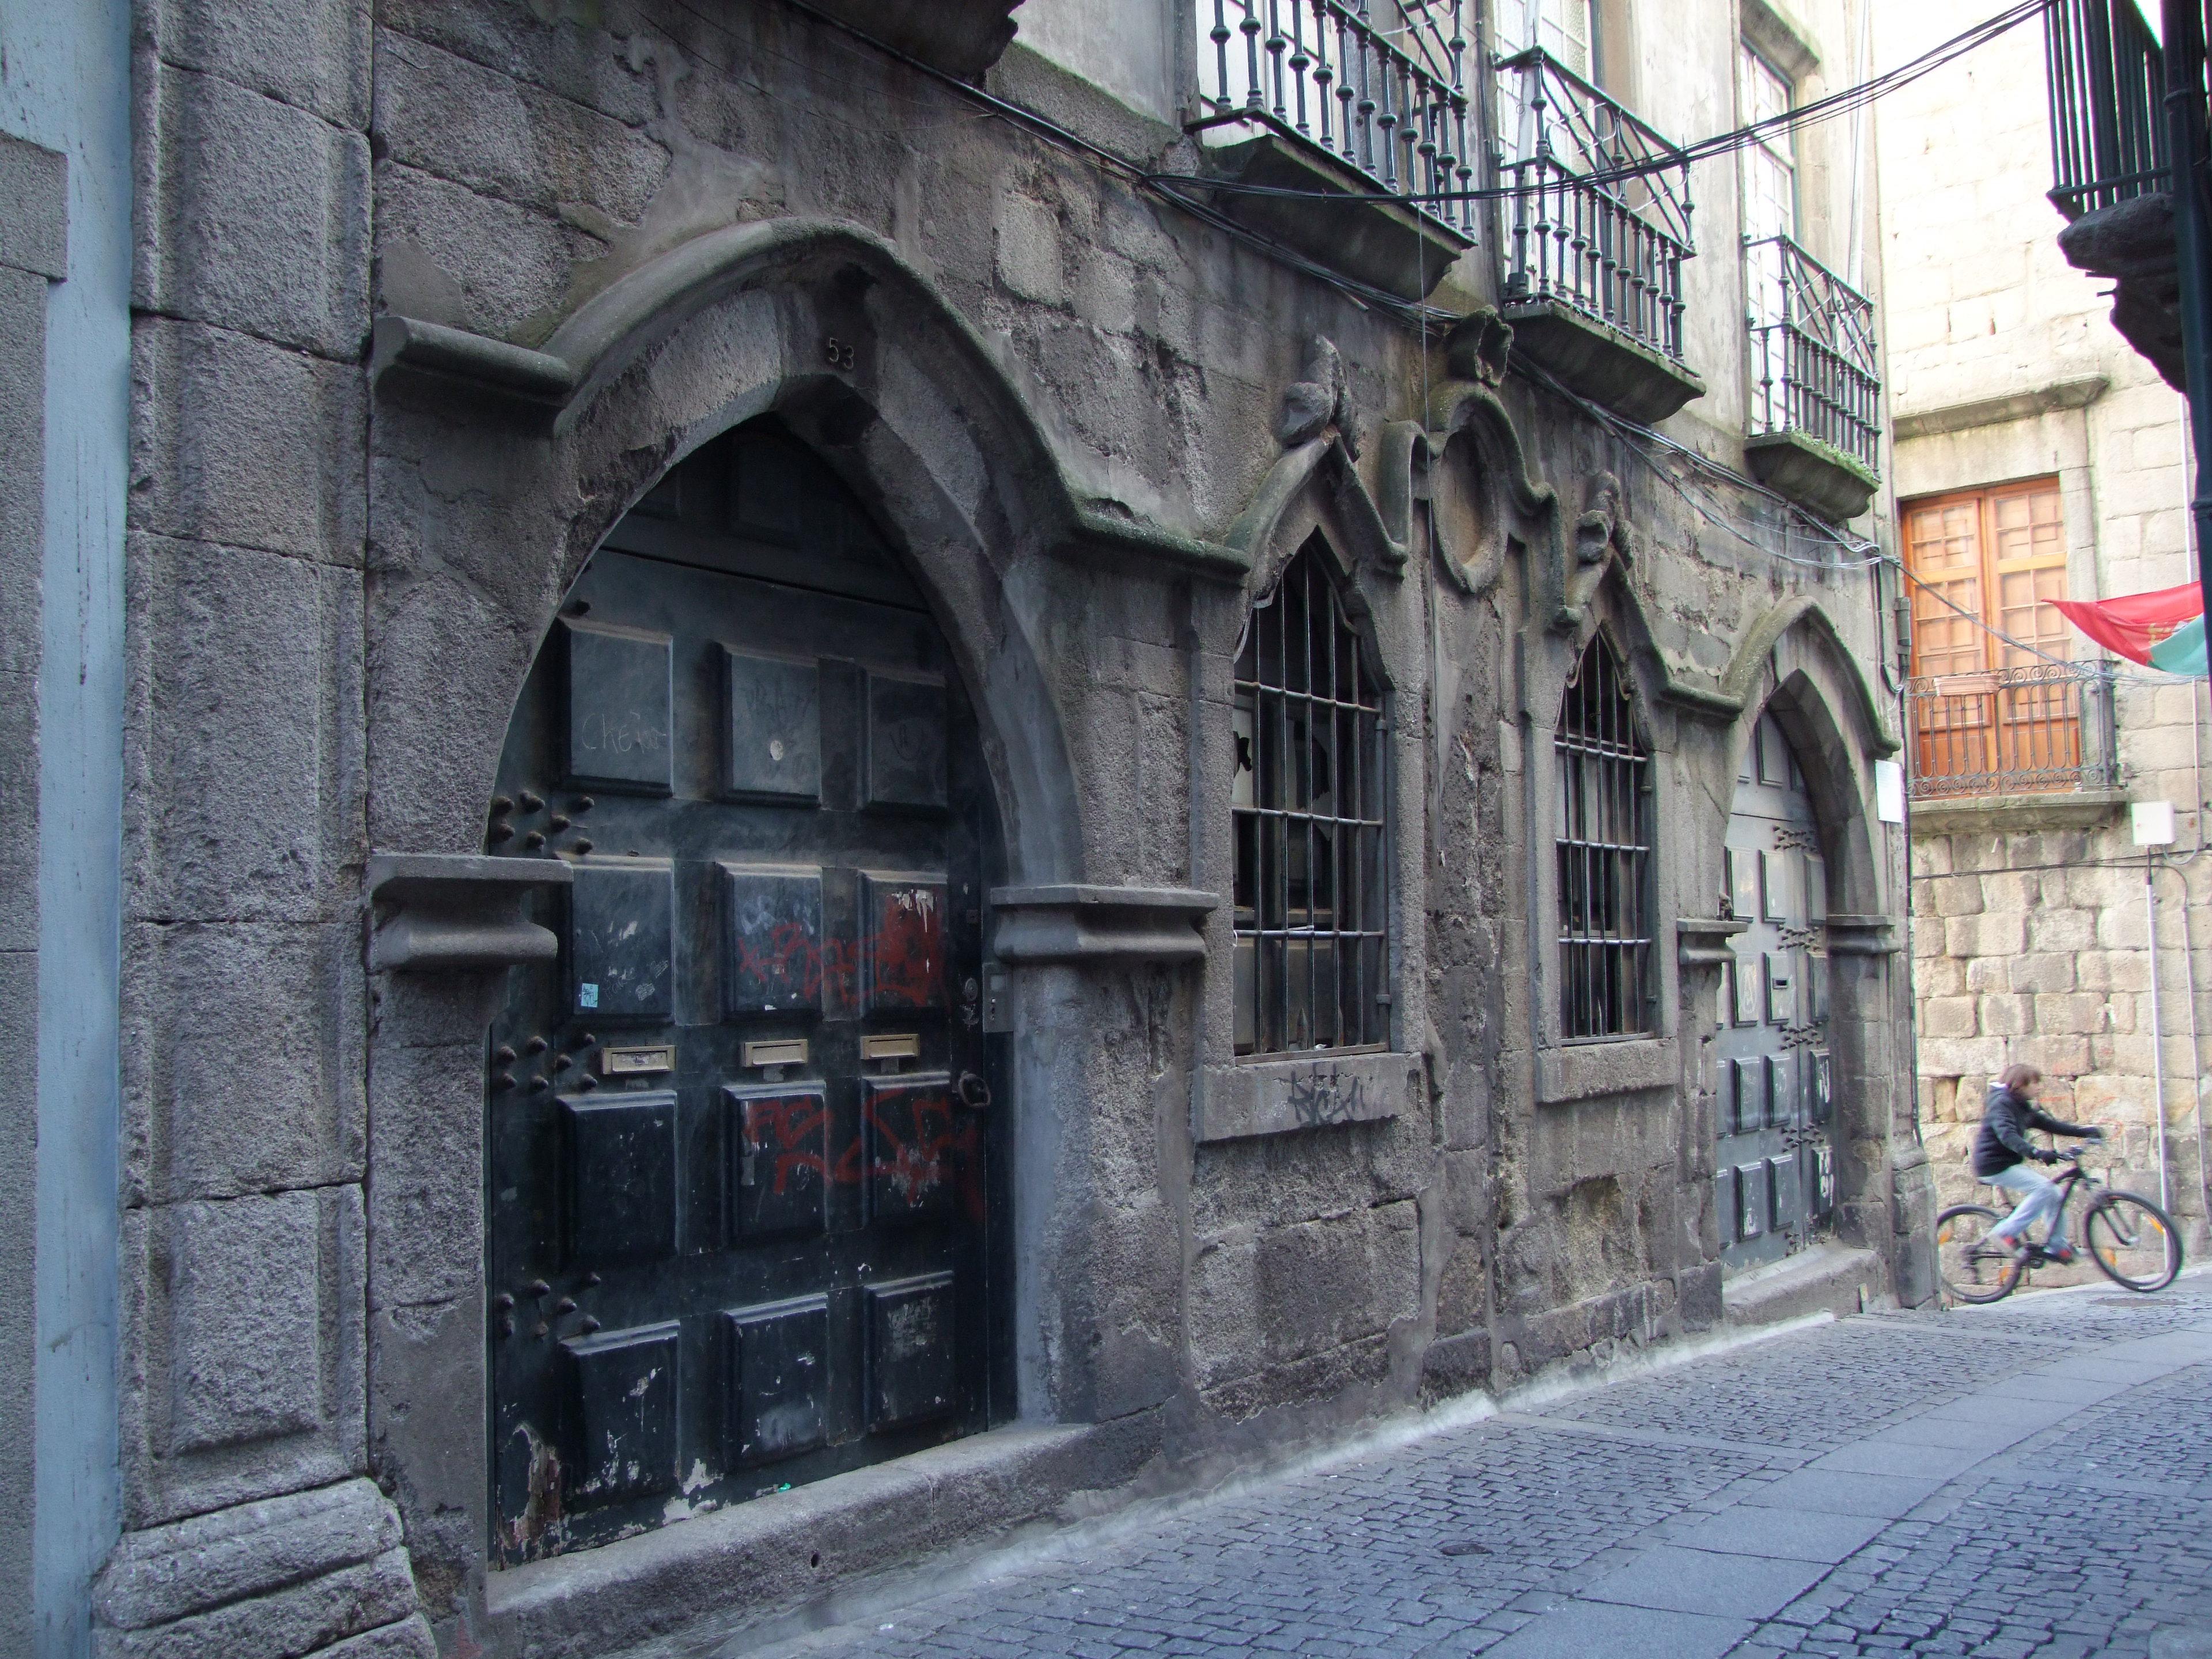 Casa da Rua da Reboleira